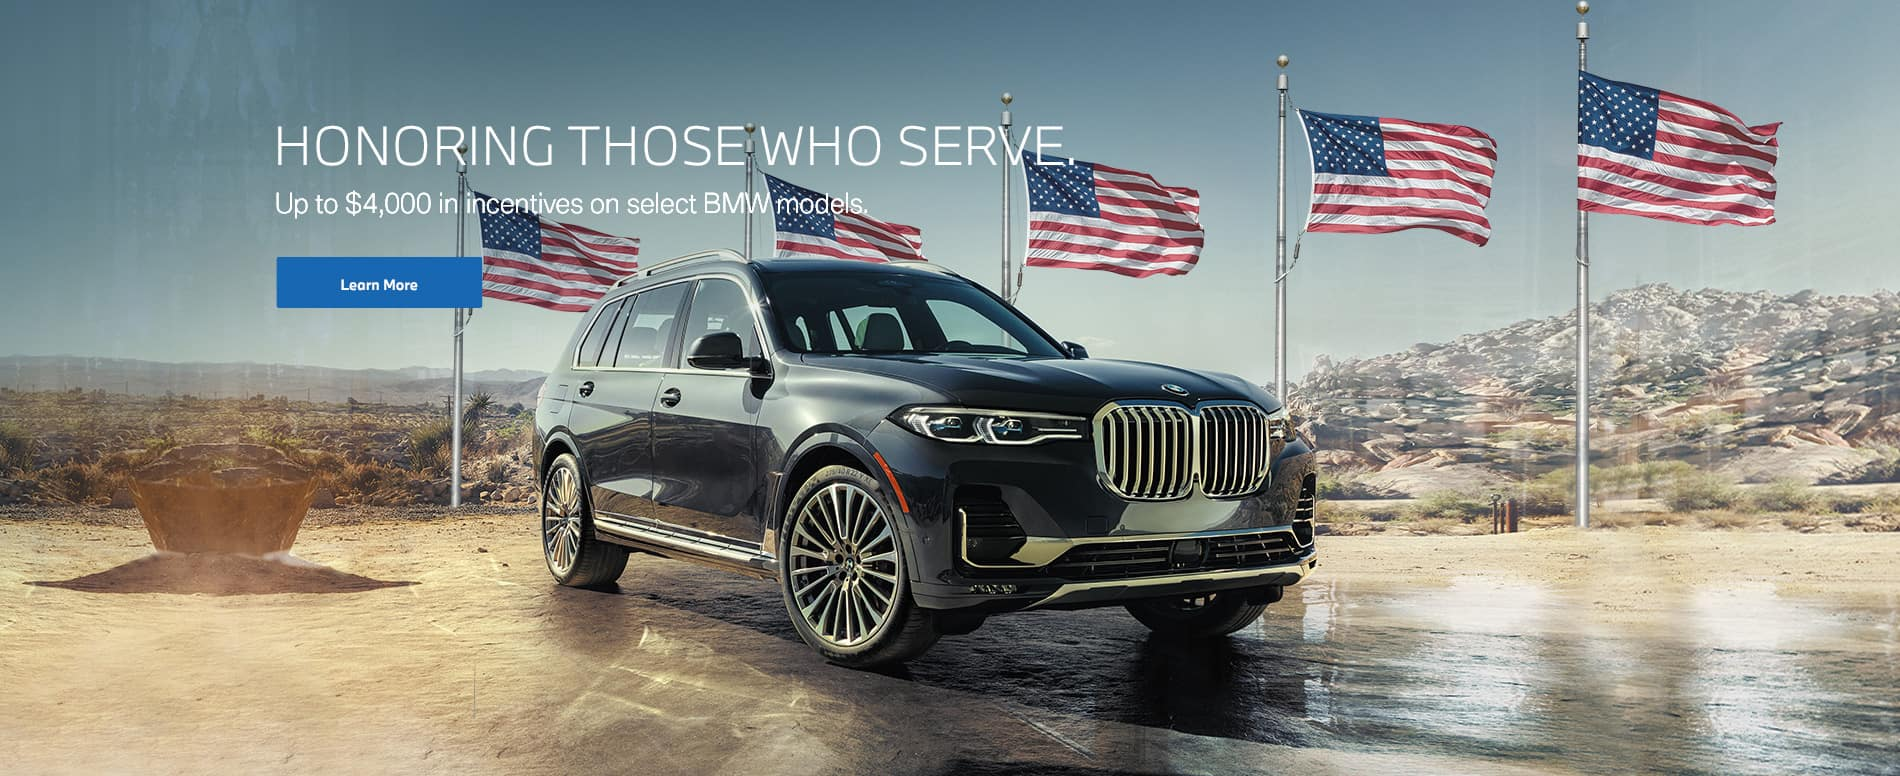 BMW Military Incentive